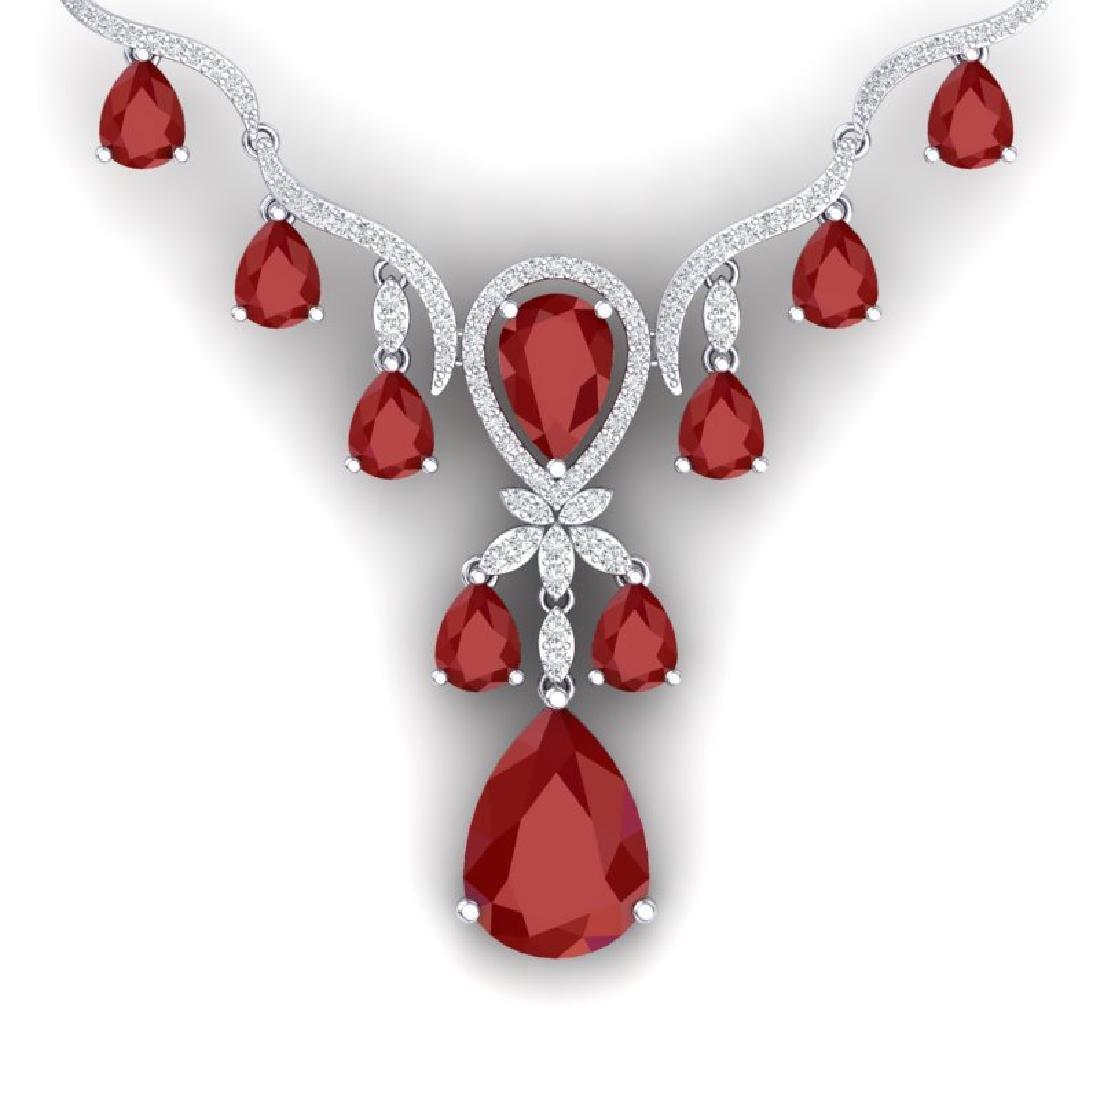 36.14 CTW Royalty Ruby & VS Diamond Necklace 18K White